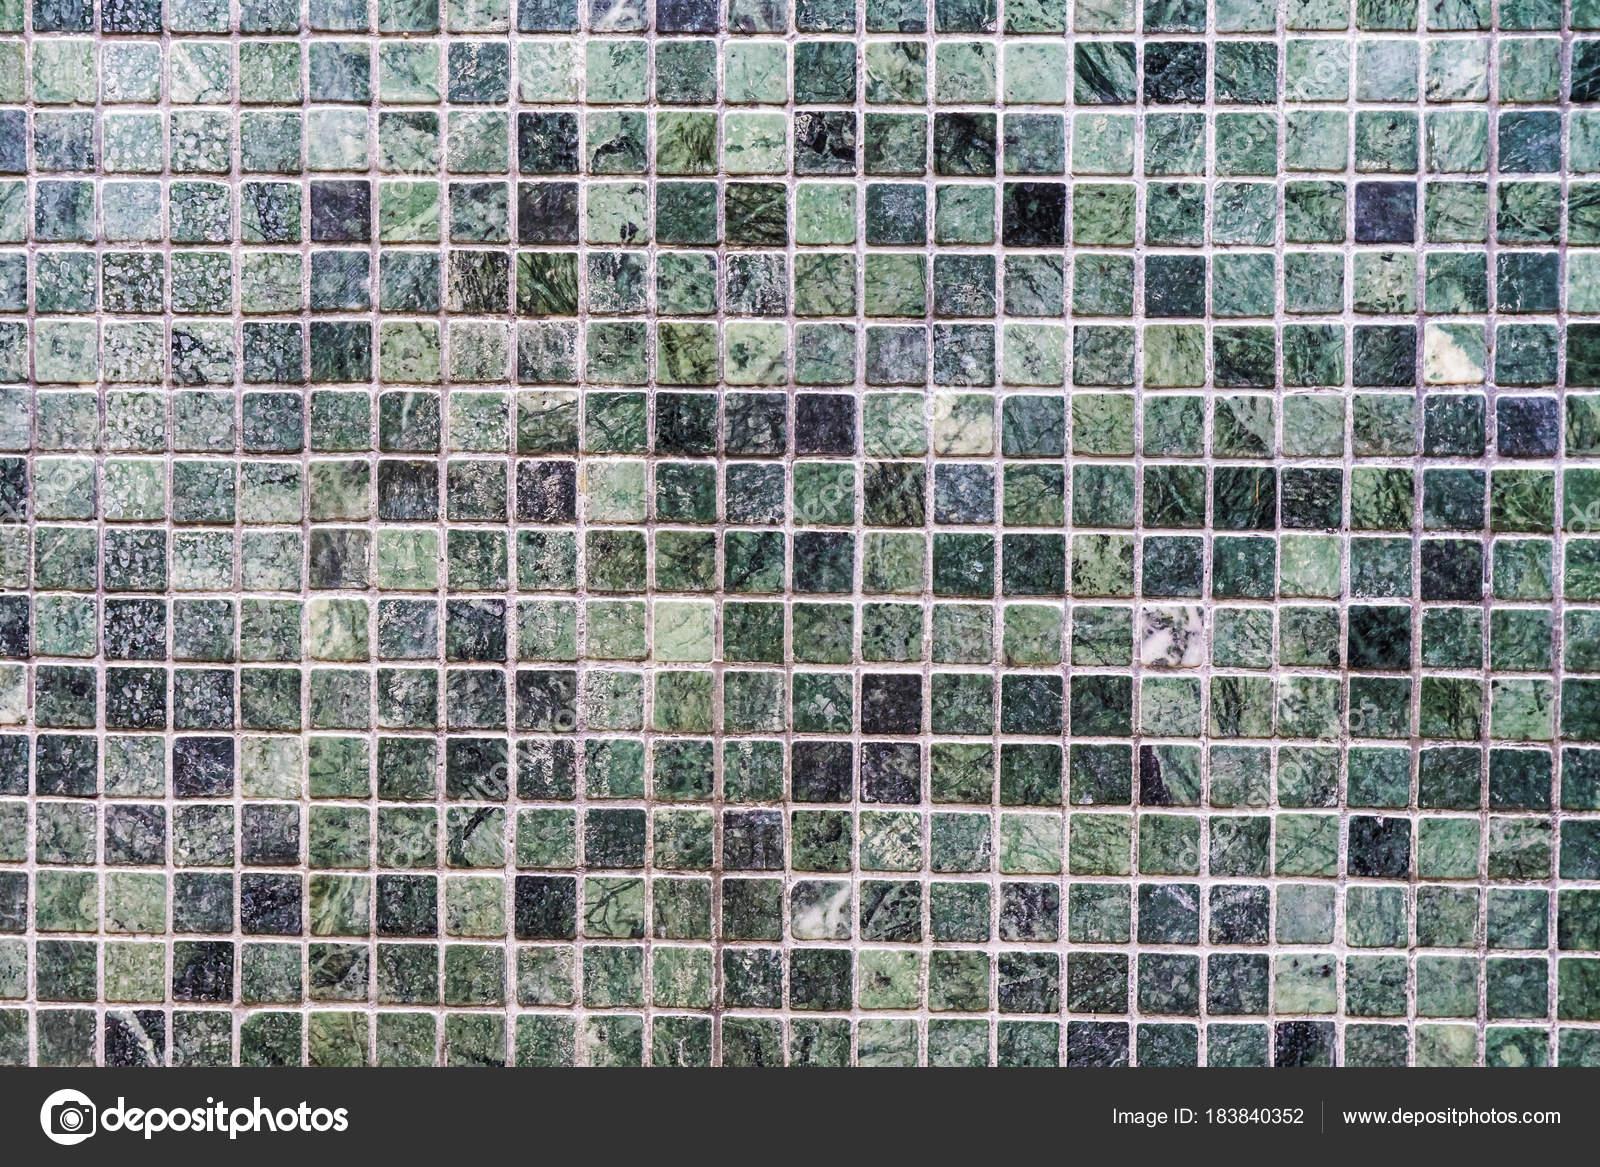 Parete verde piastrelle in porcellana mosaico texture sfondo